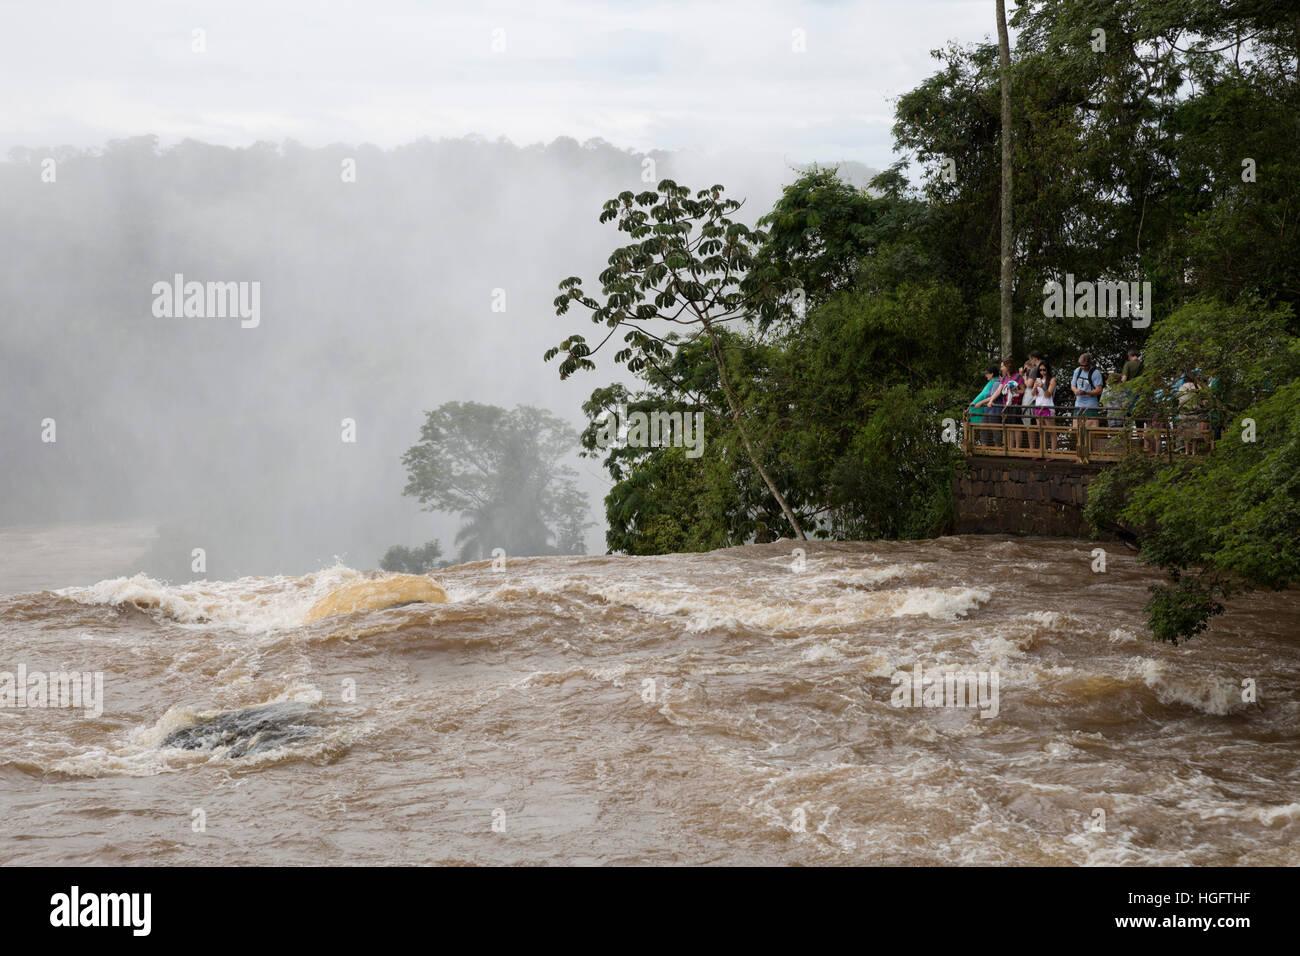 Iguazu Falls, Iguazu National Park, Misiones Province, The Northeast, Argentina, South America Stock Photo